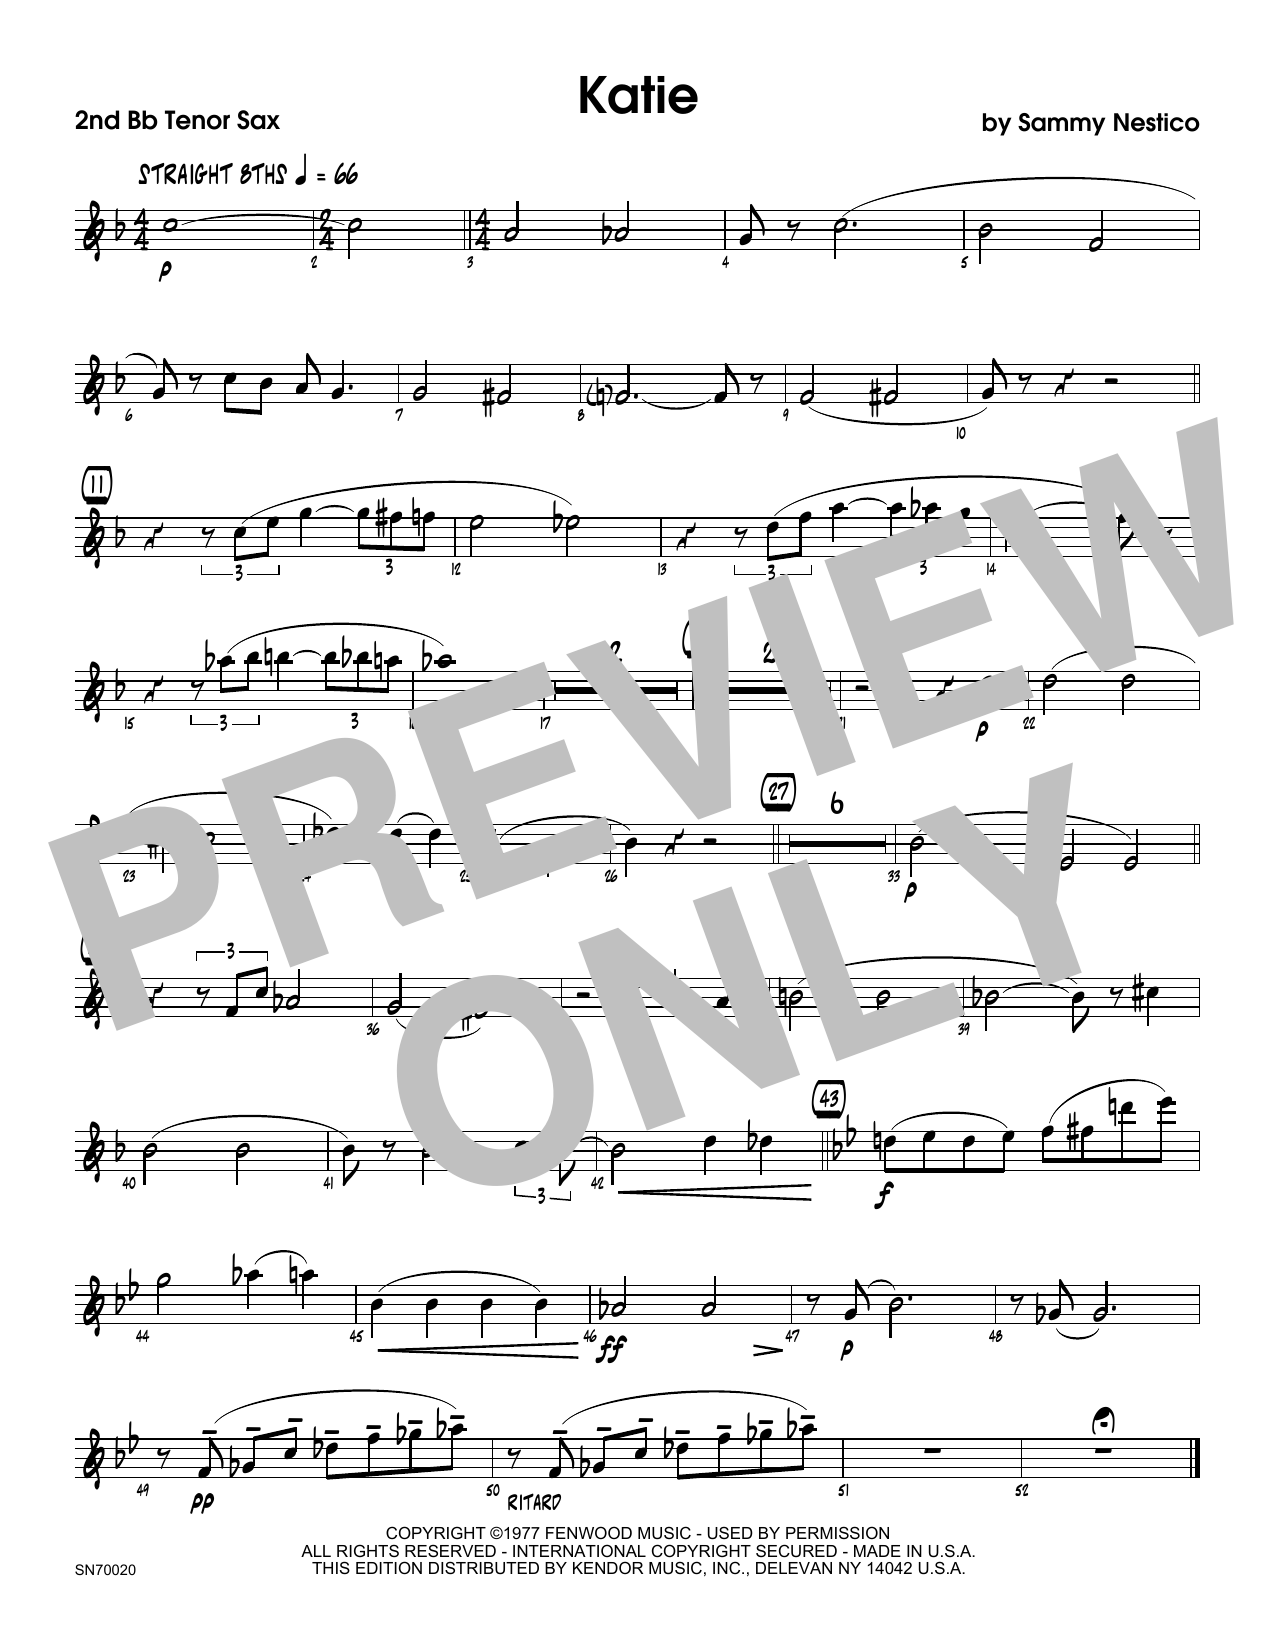 Katie - 2nd Bb Tenor Saxophone Sheet Music